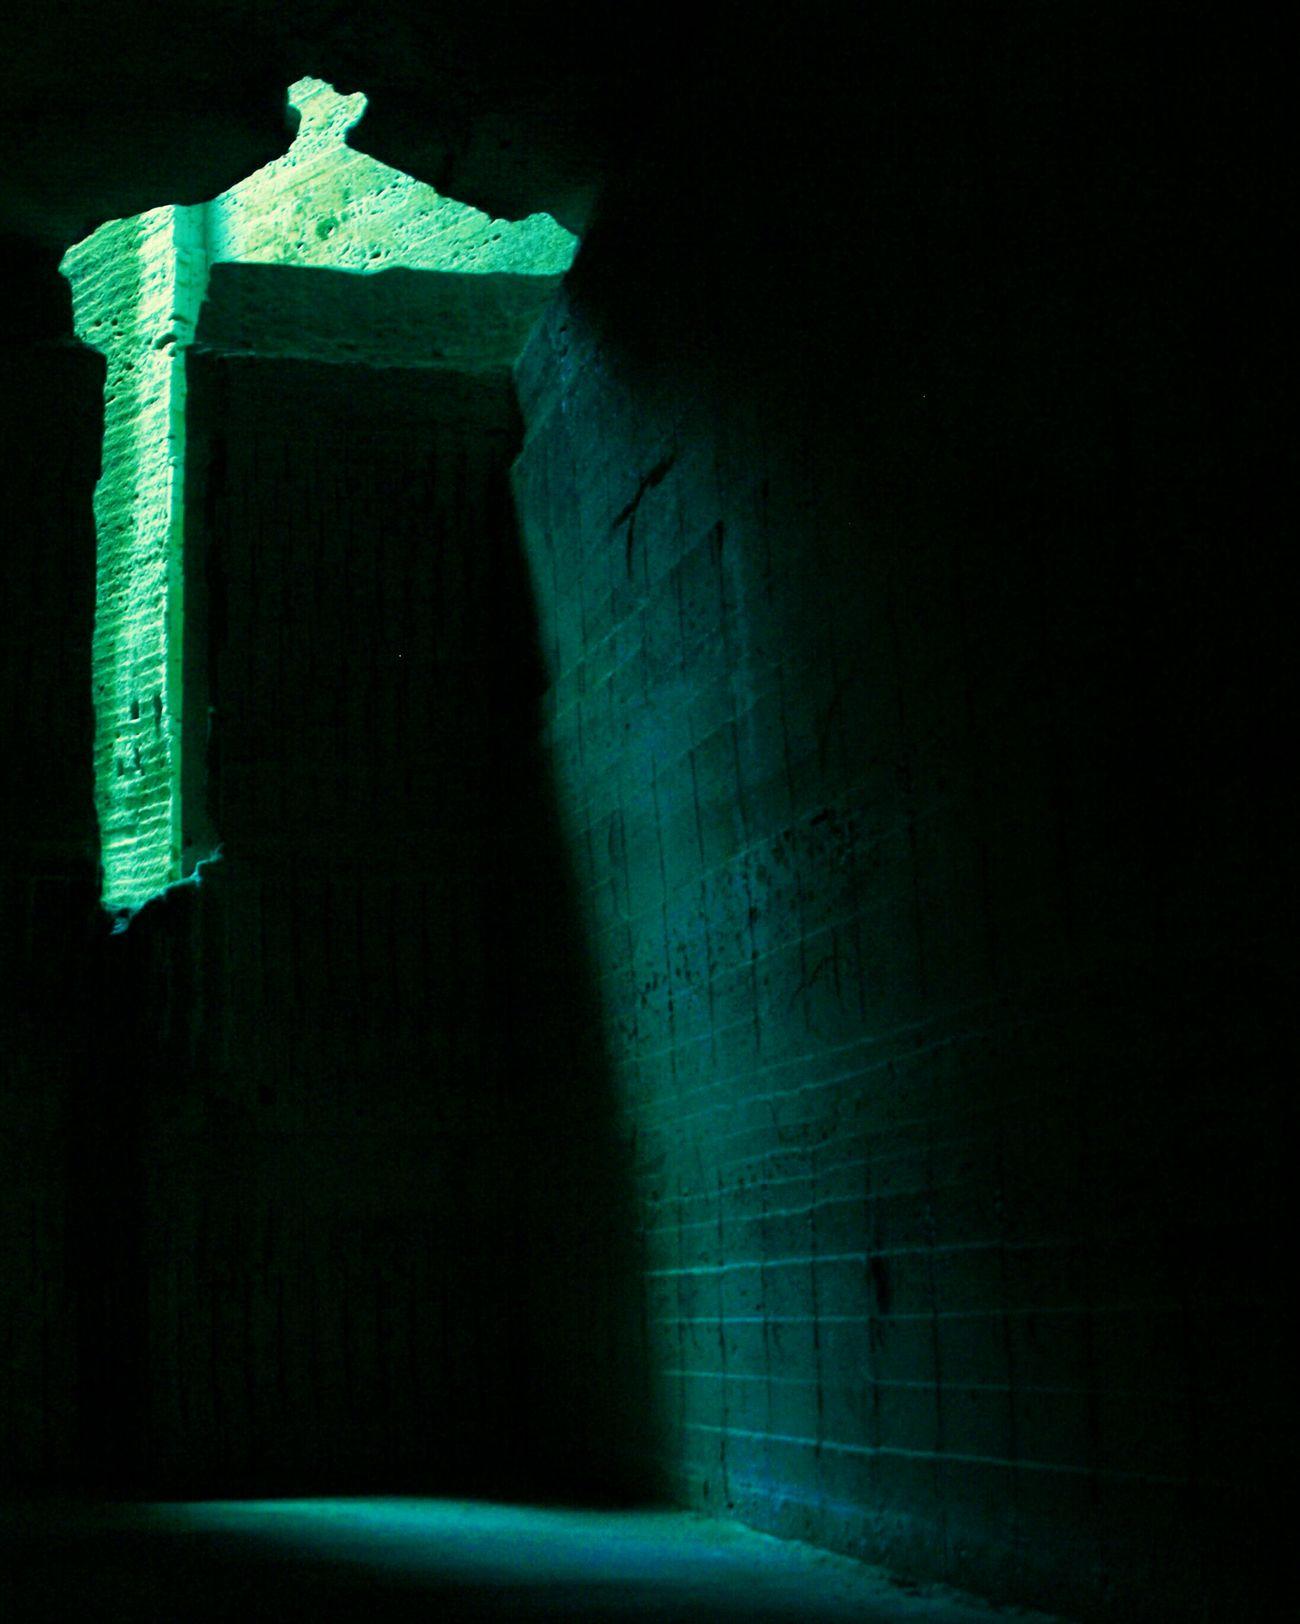 闇 明 影 光 Hello World Stone Wall Light And Shadows 大谷石採石場跡